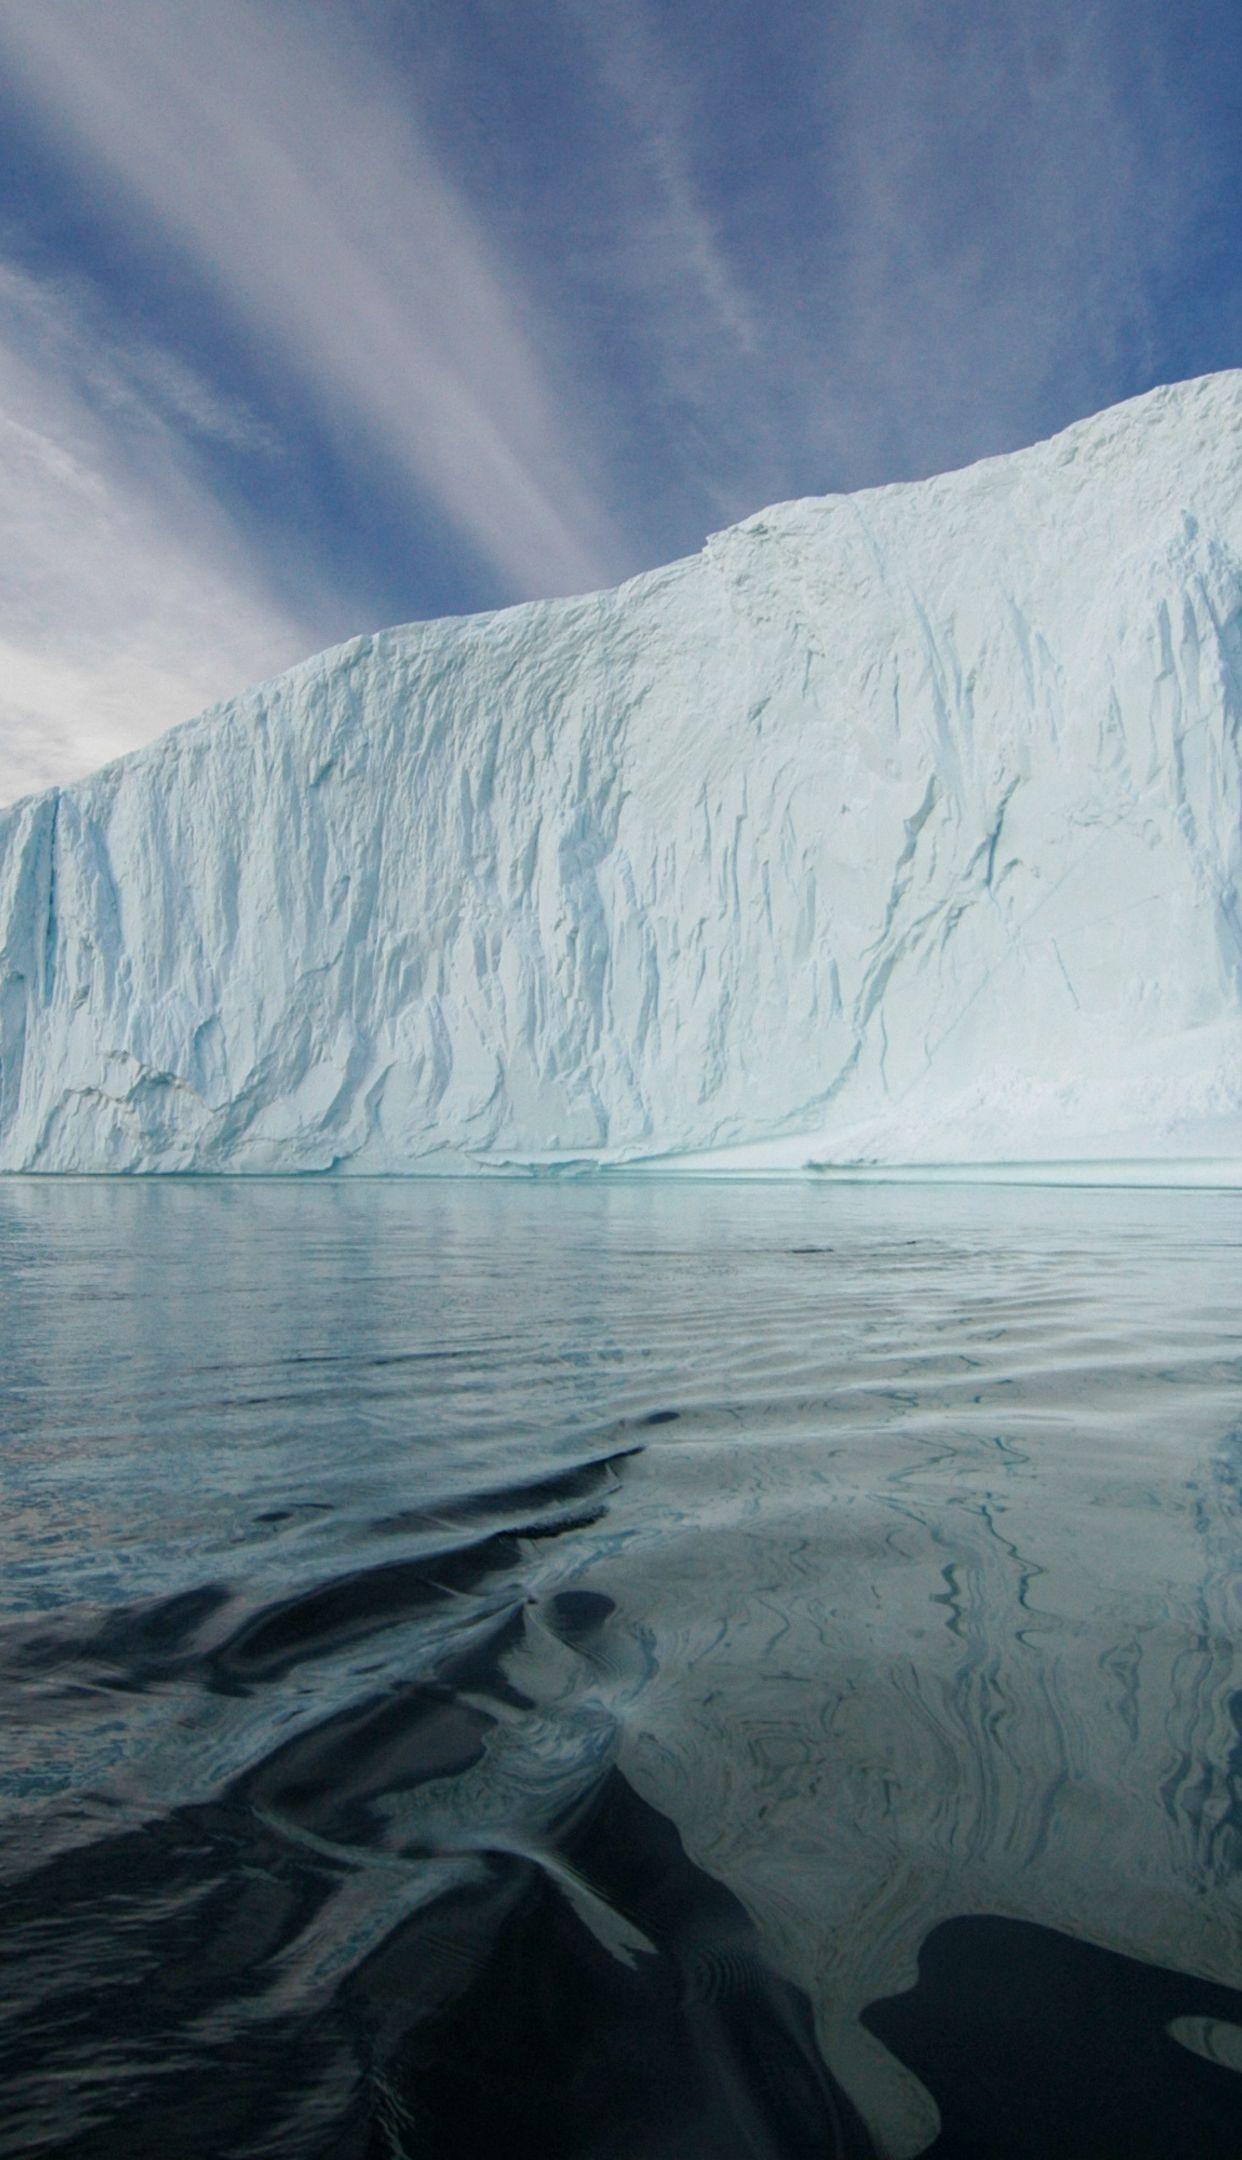 Greenland National Park 1242x2208 4k HD wallpaper wallpprscom 1242x2160